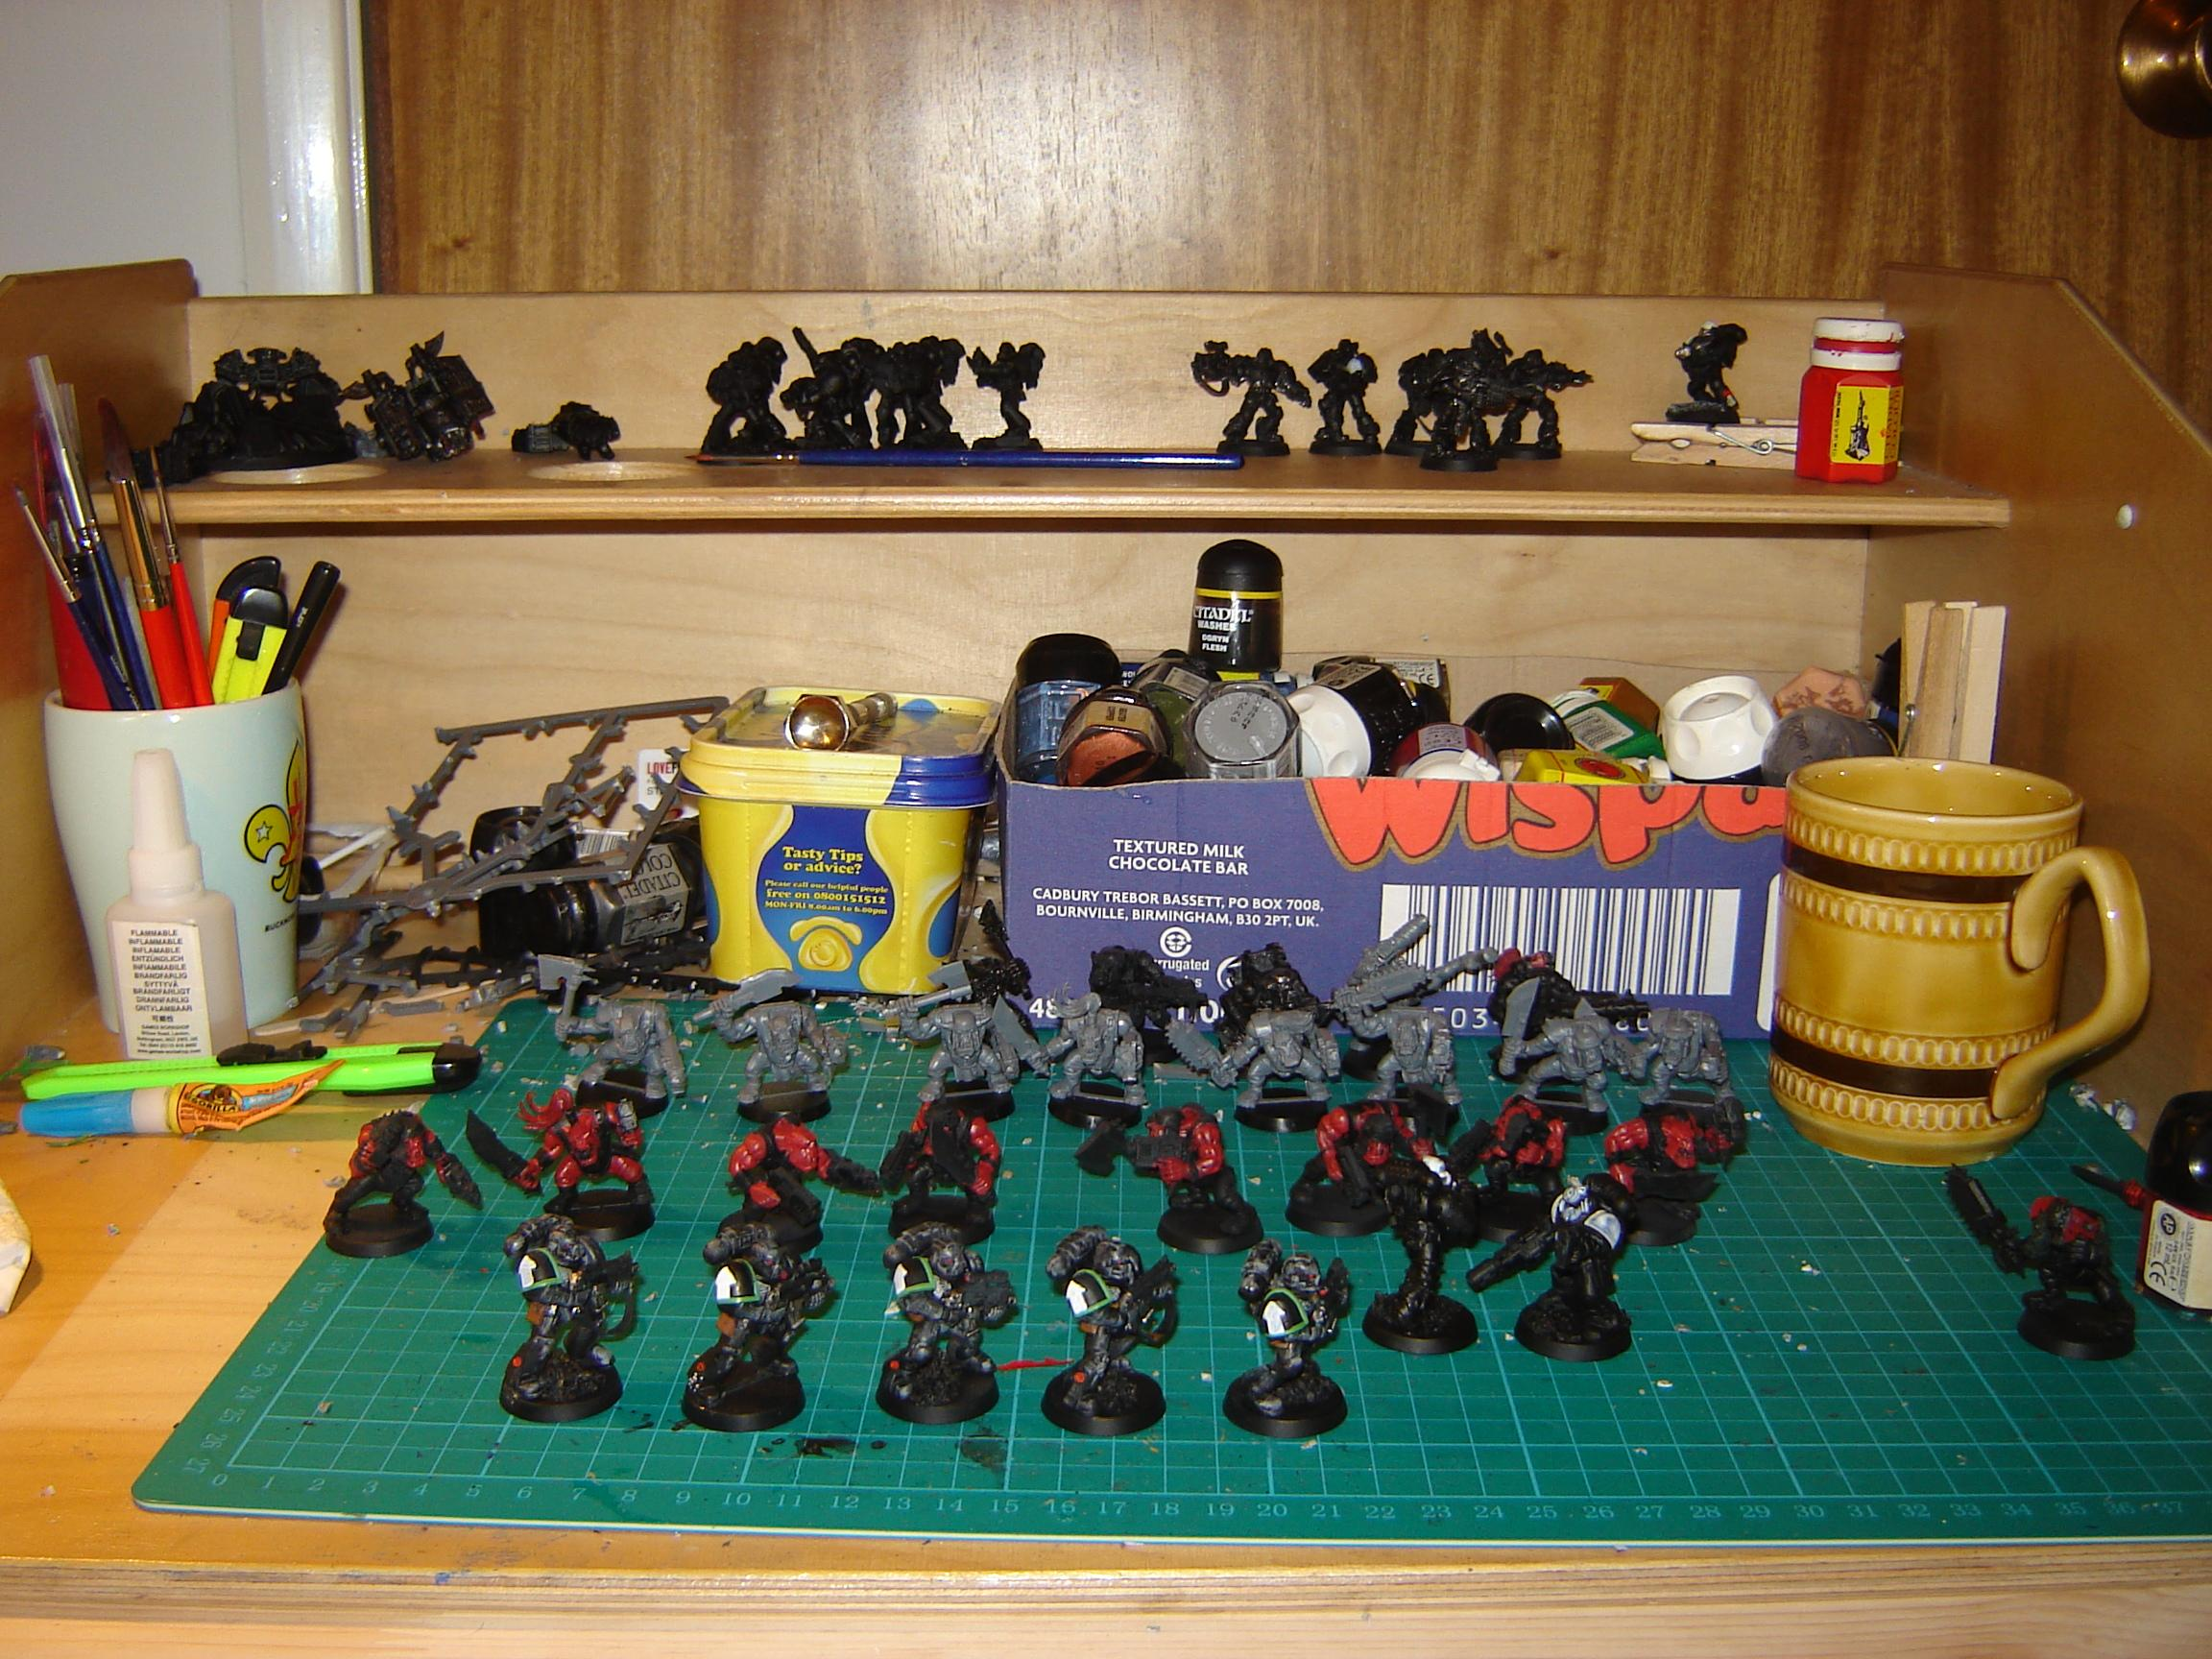 Raven Guard, Space Marines, Warhammer 40,000, Work In Progress